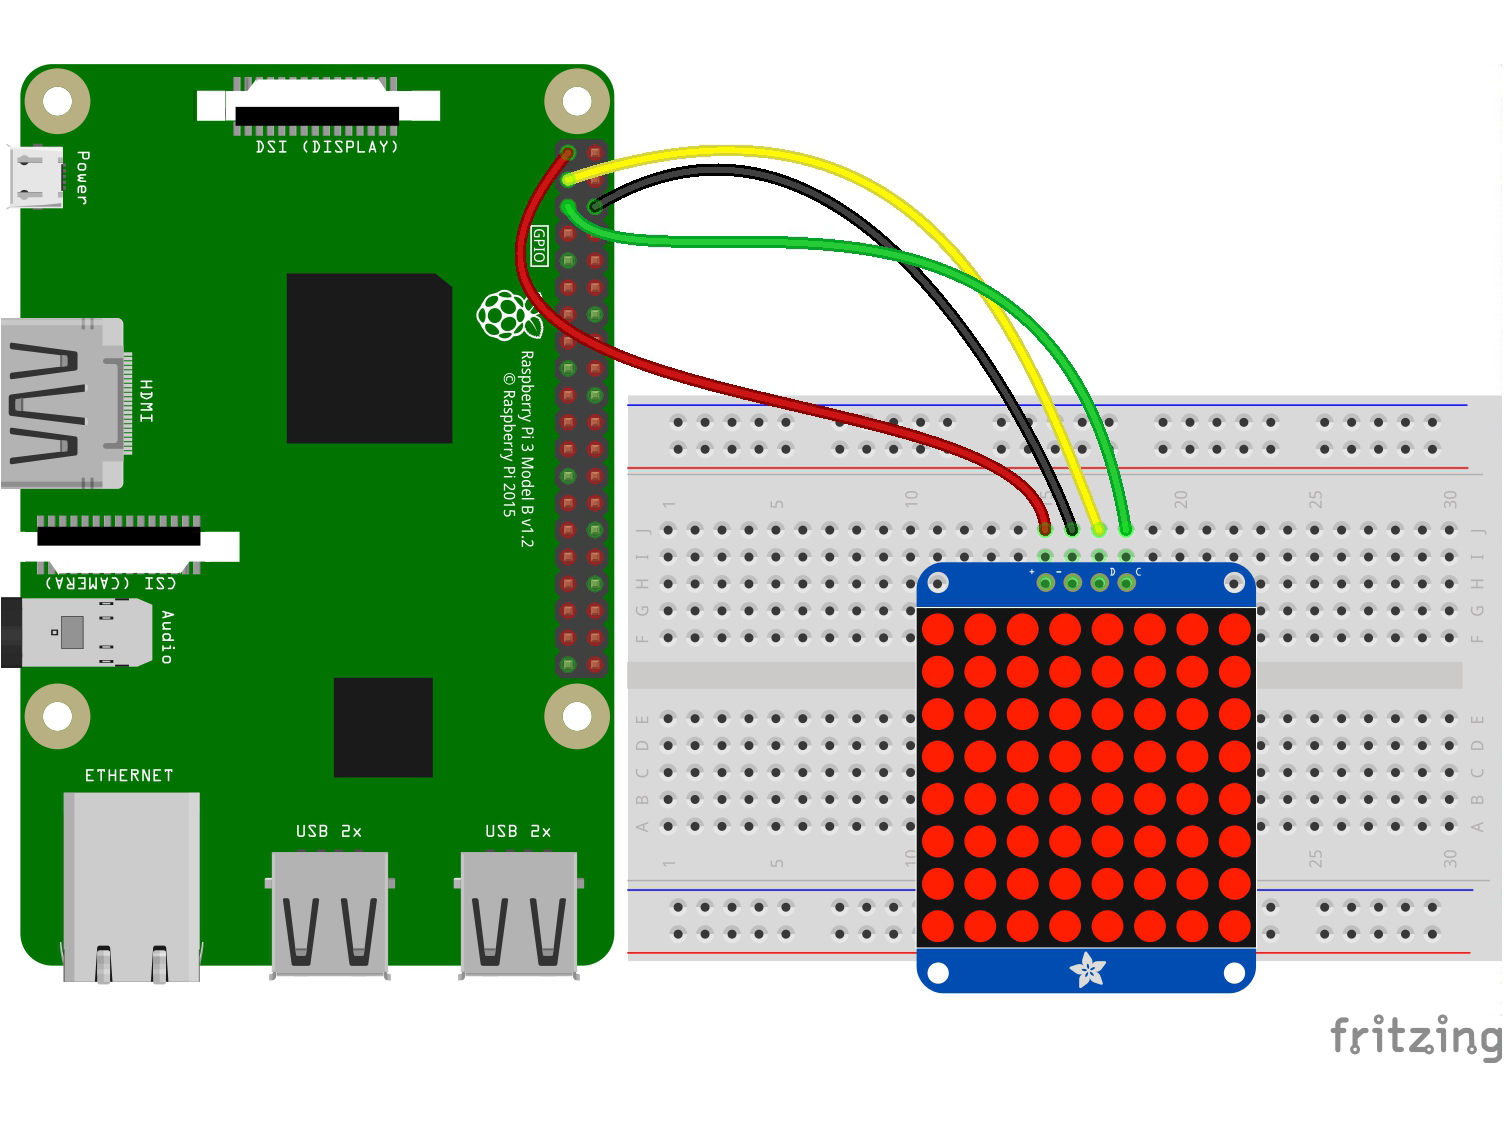 led_matrices_raspberry-pi-1.2-8x8_bb.jpg